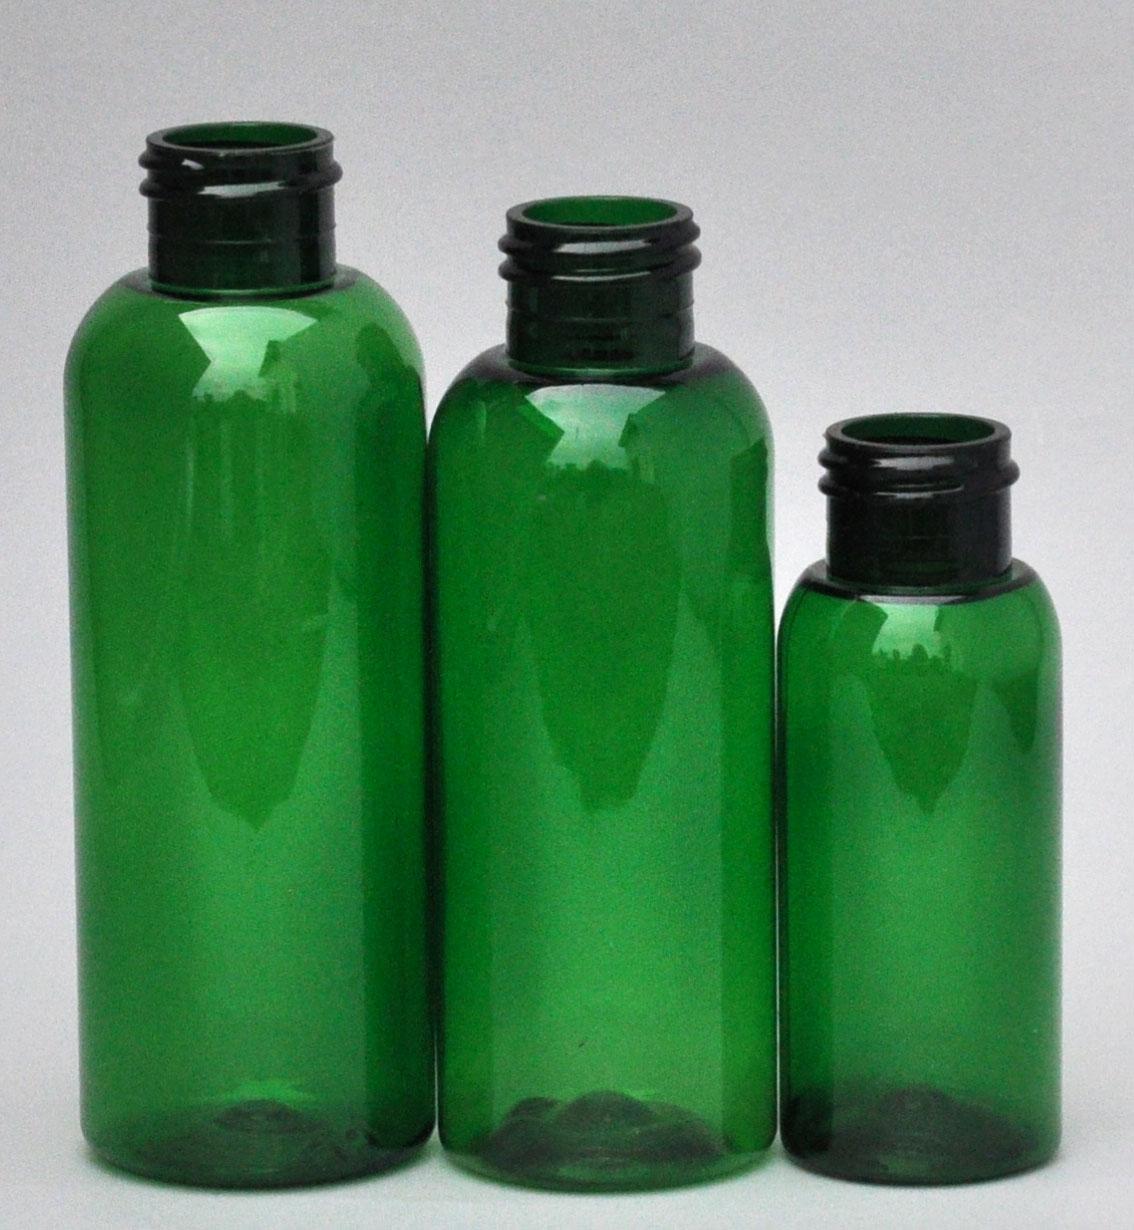 SNEP-50BPETG-50ml Green PET Boston Bottle with 24/410 Neck